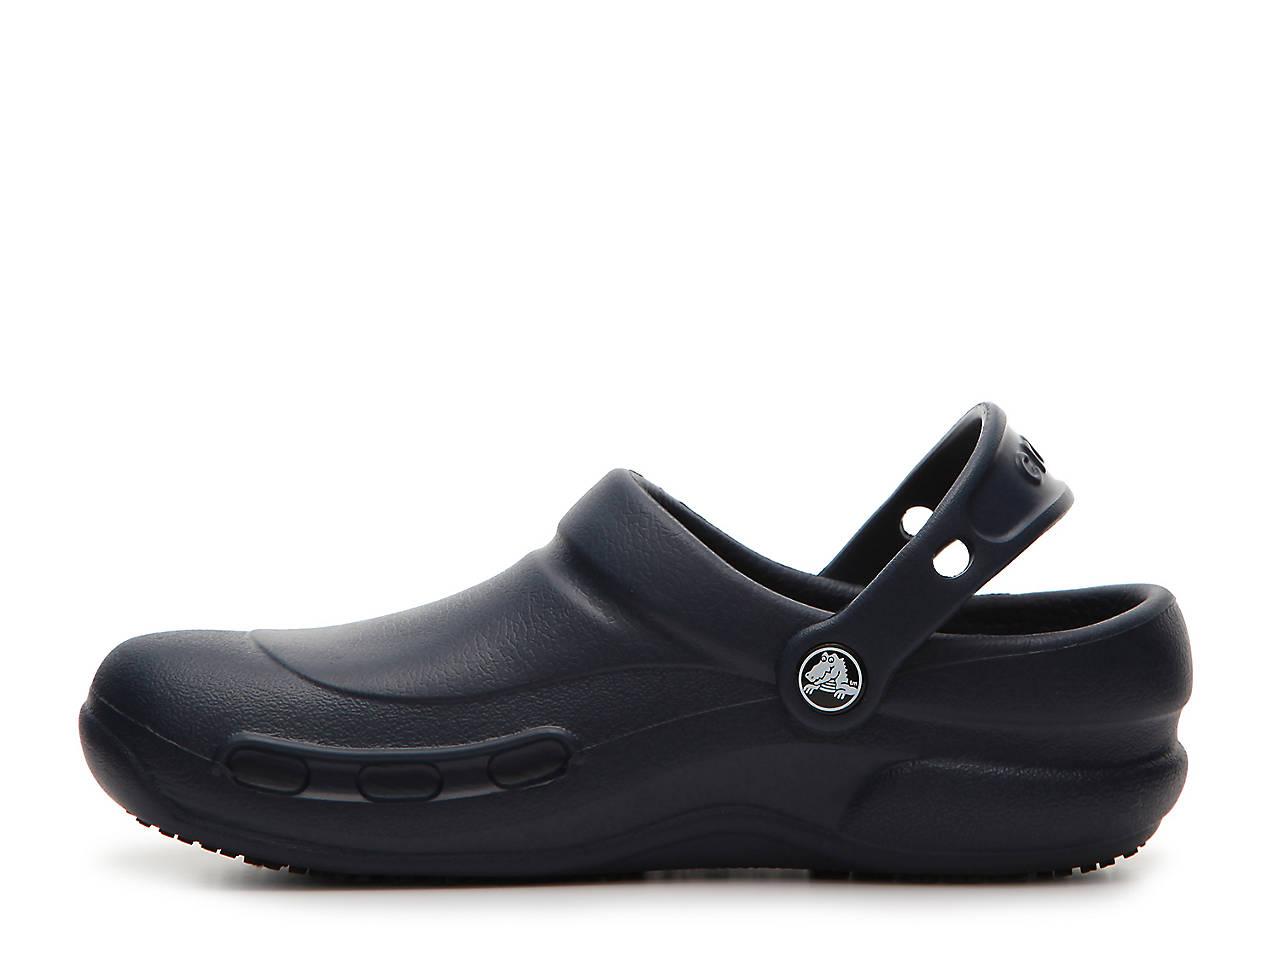 9253cbe56c32f8 Crocs Bistro Work Clog Women s Shoes